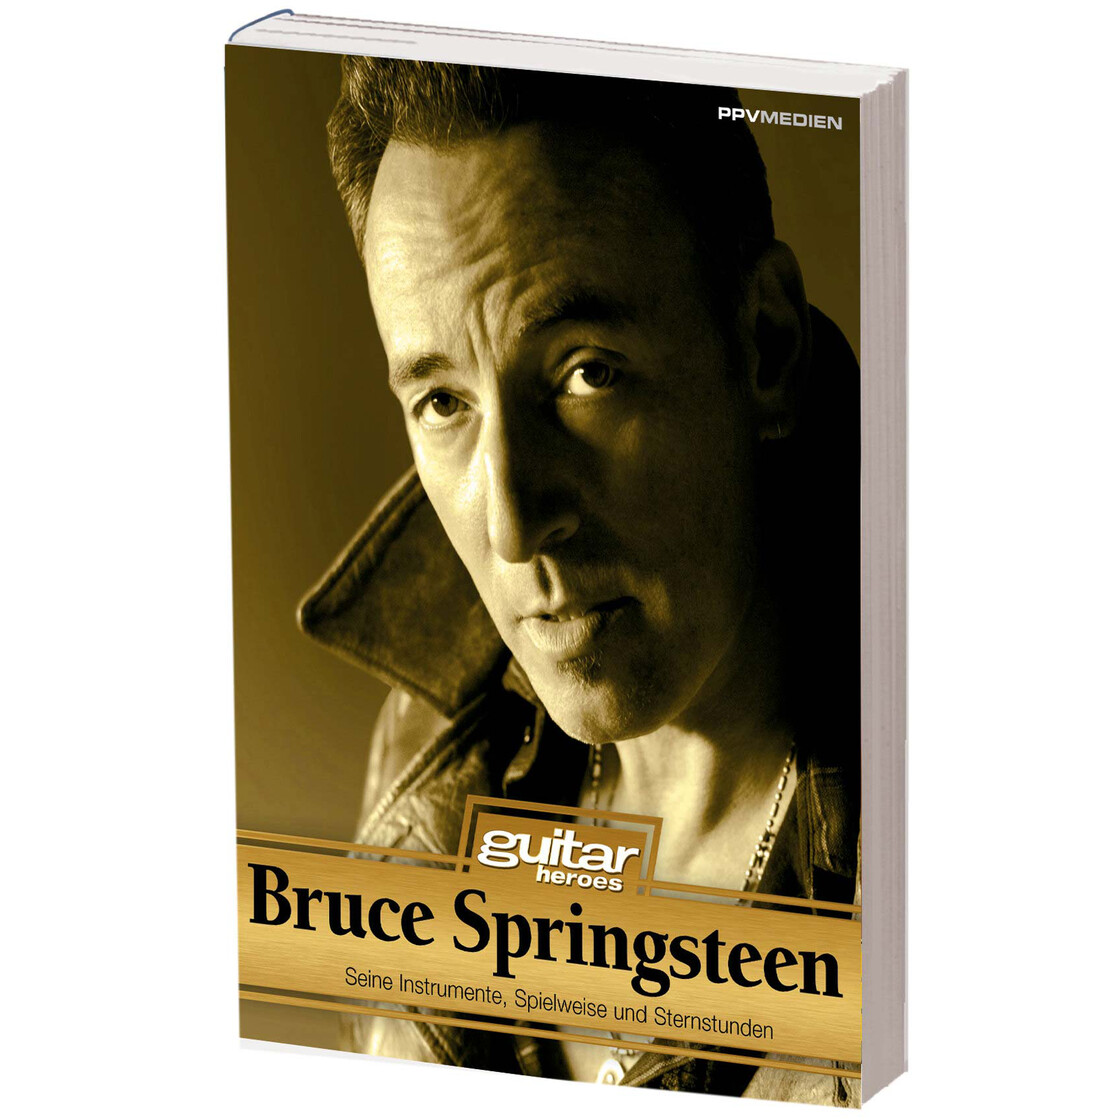 Guitar Heros Bruce Springsteen